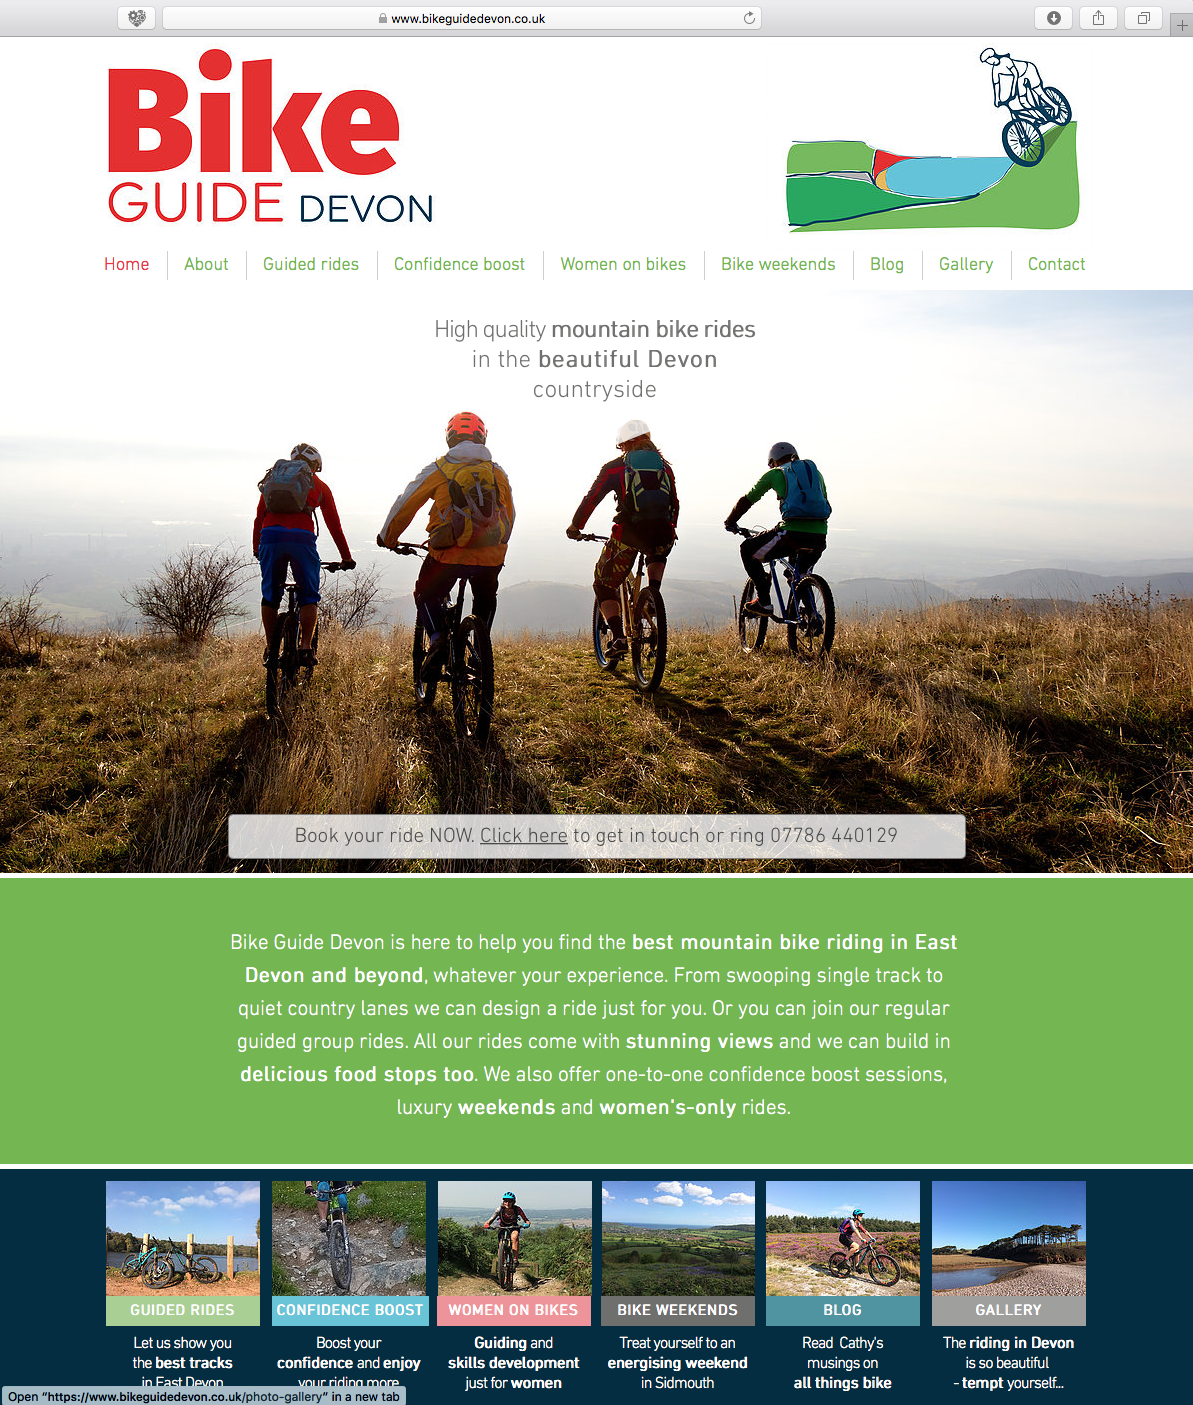 Bike Guide Devon